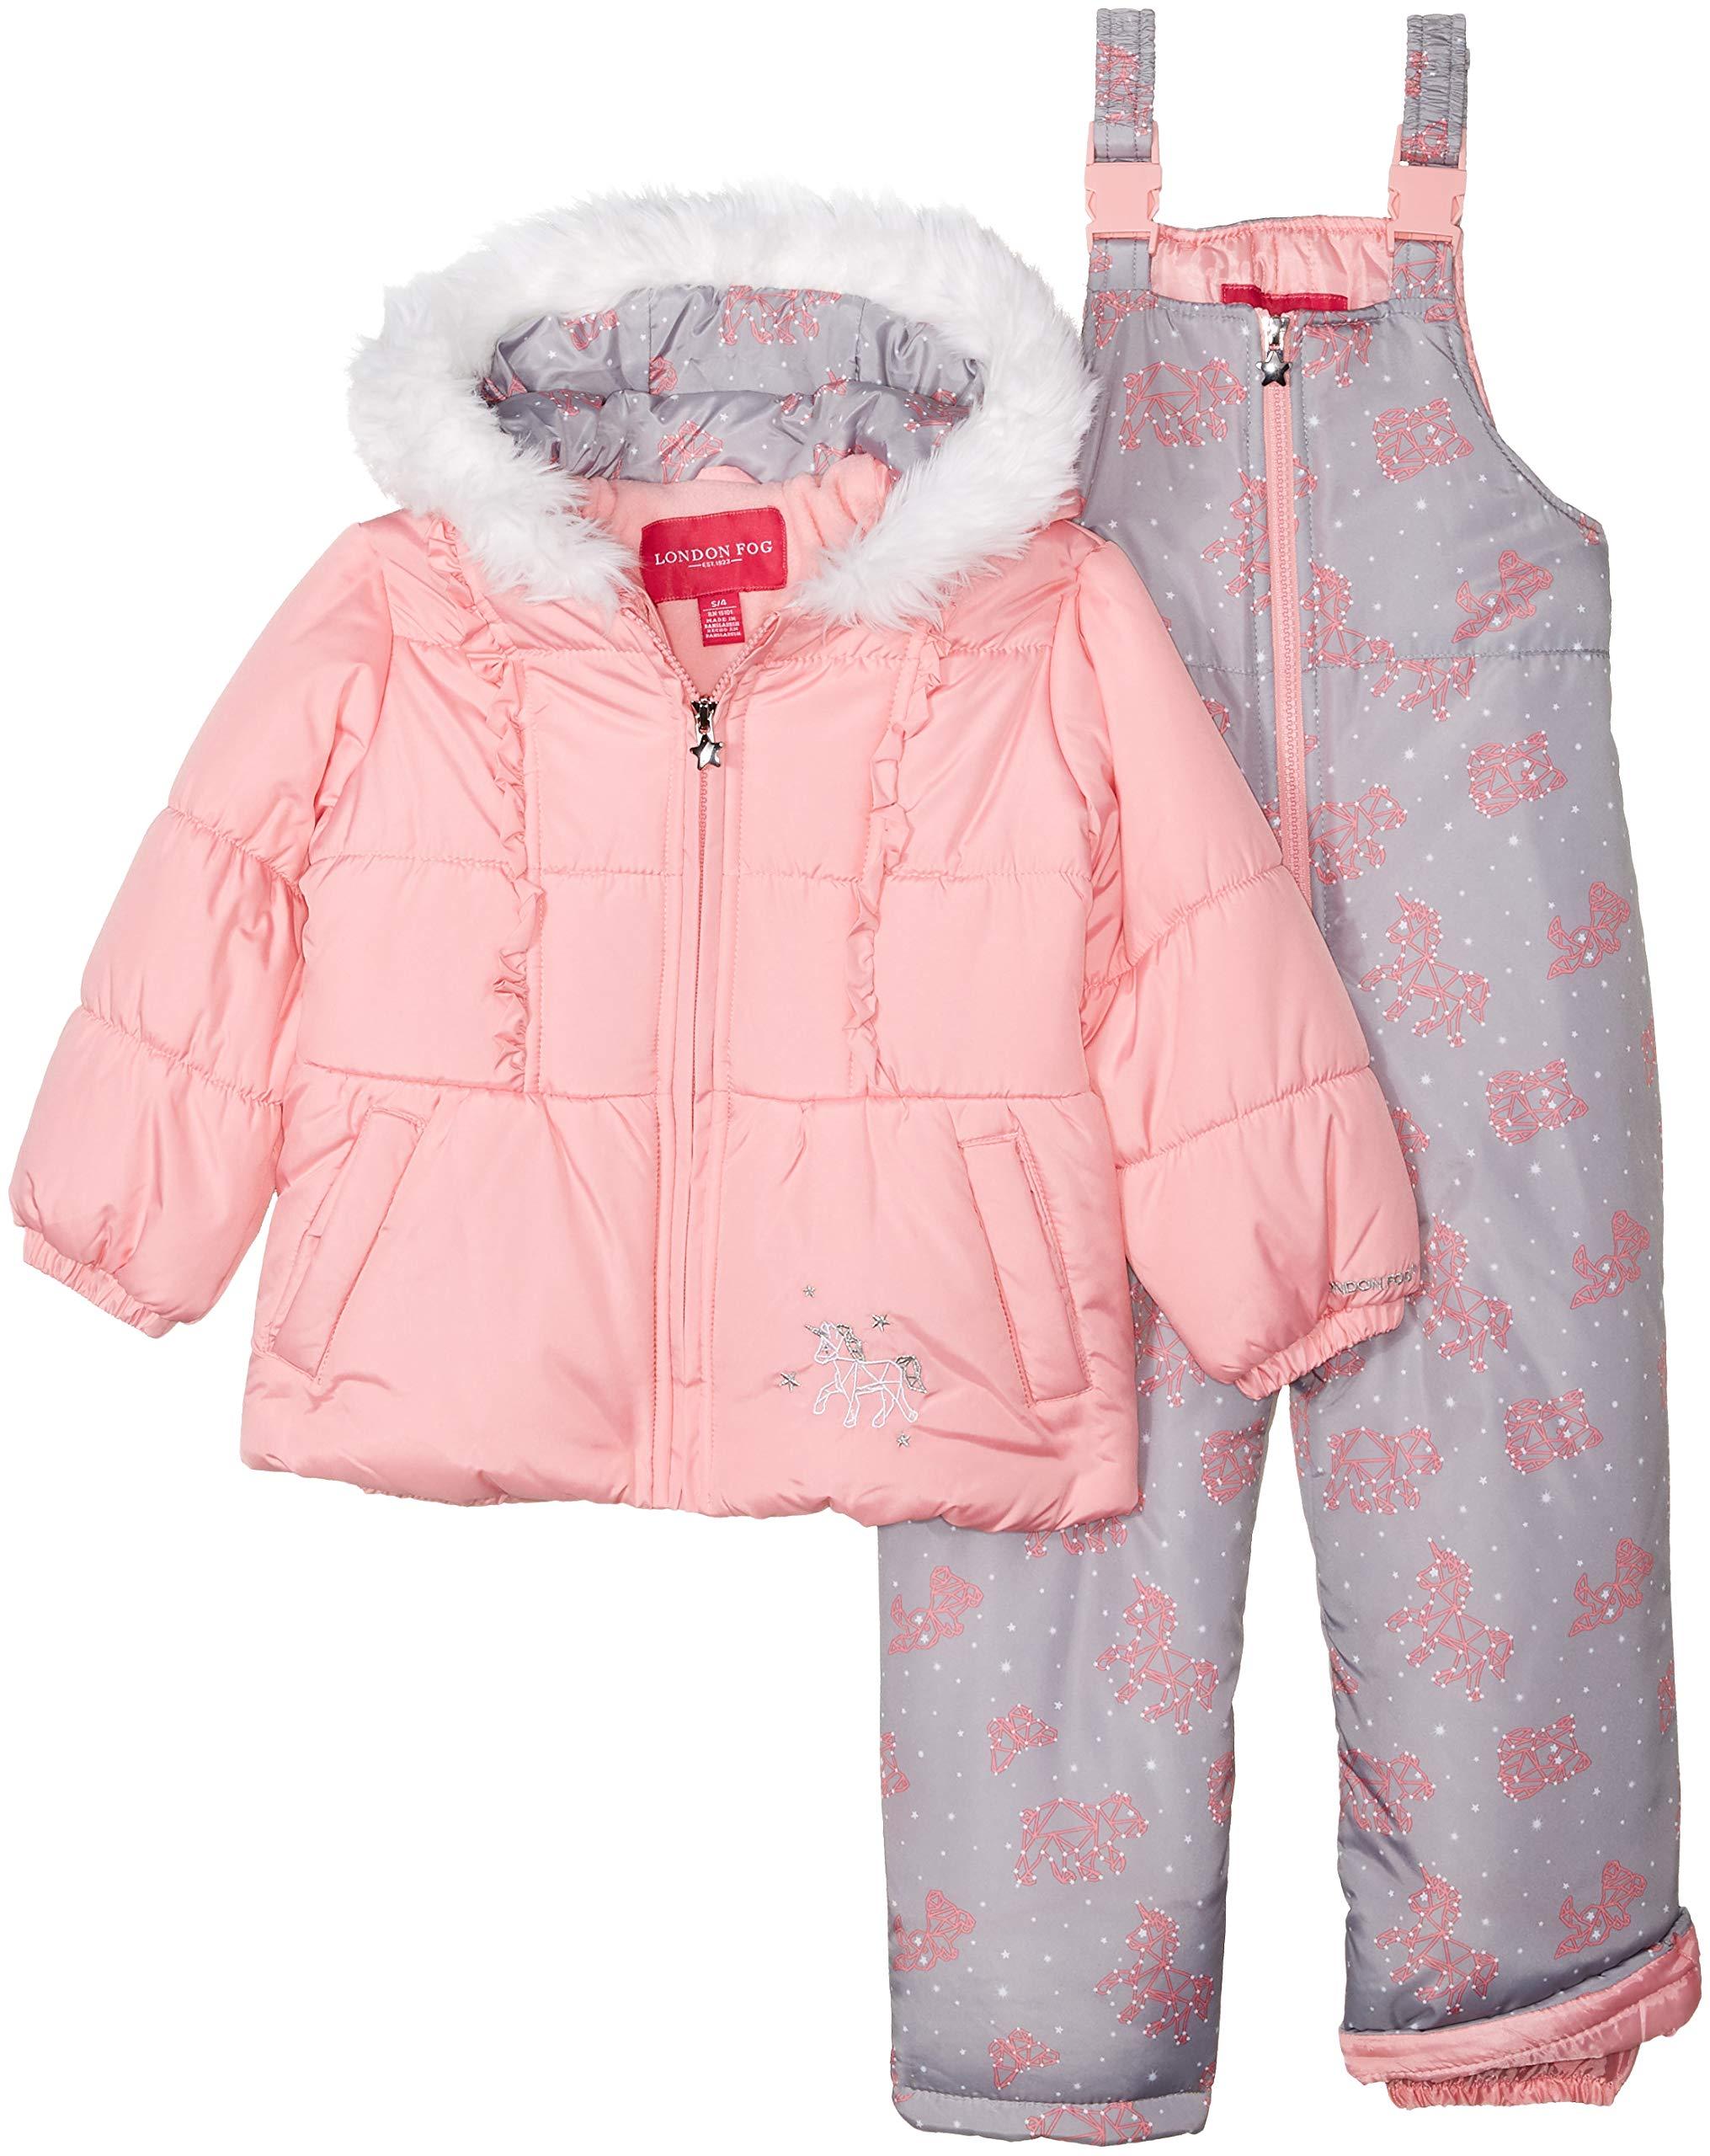 London Fog Girls' Little Snowsuit with Snowbib and Puffer Jacket, Light Pink Unicorn, 4